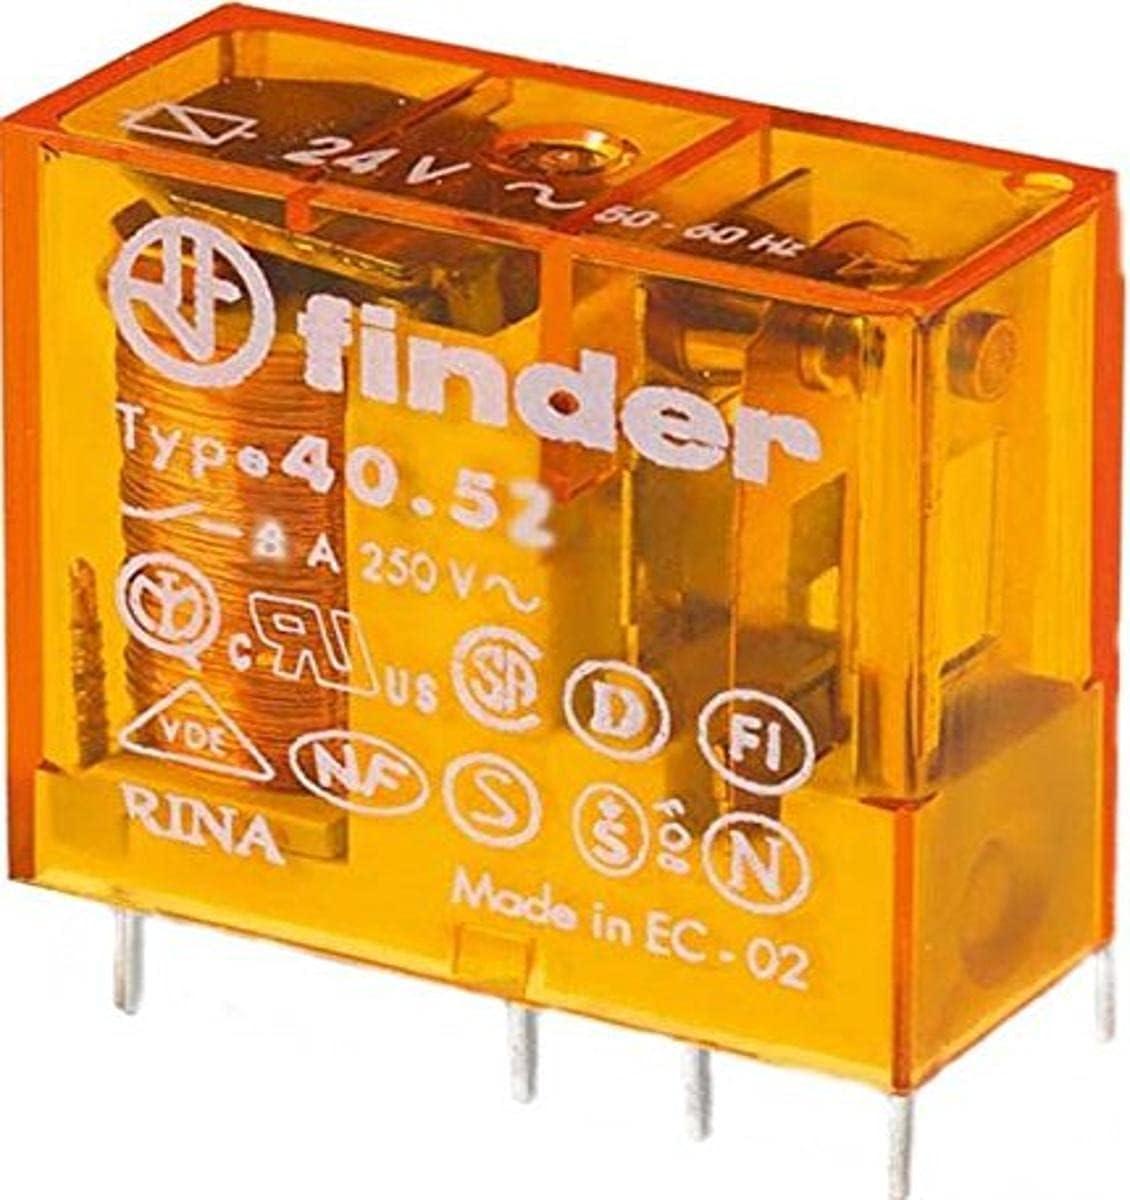 Finder serie 40 - Rele mini reticulado 5mm 2 conmutado 8a 24vac